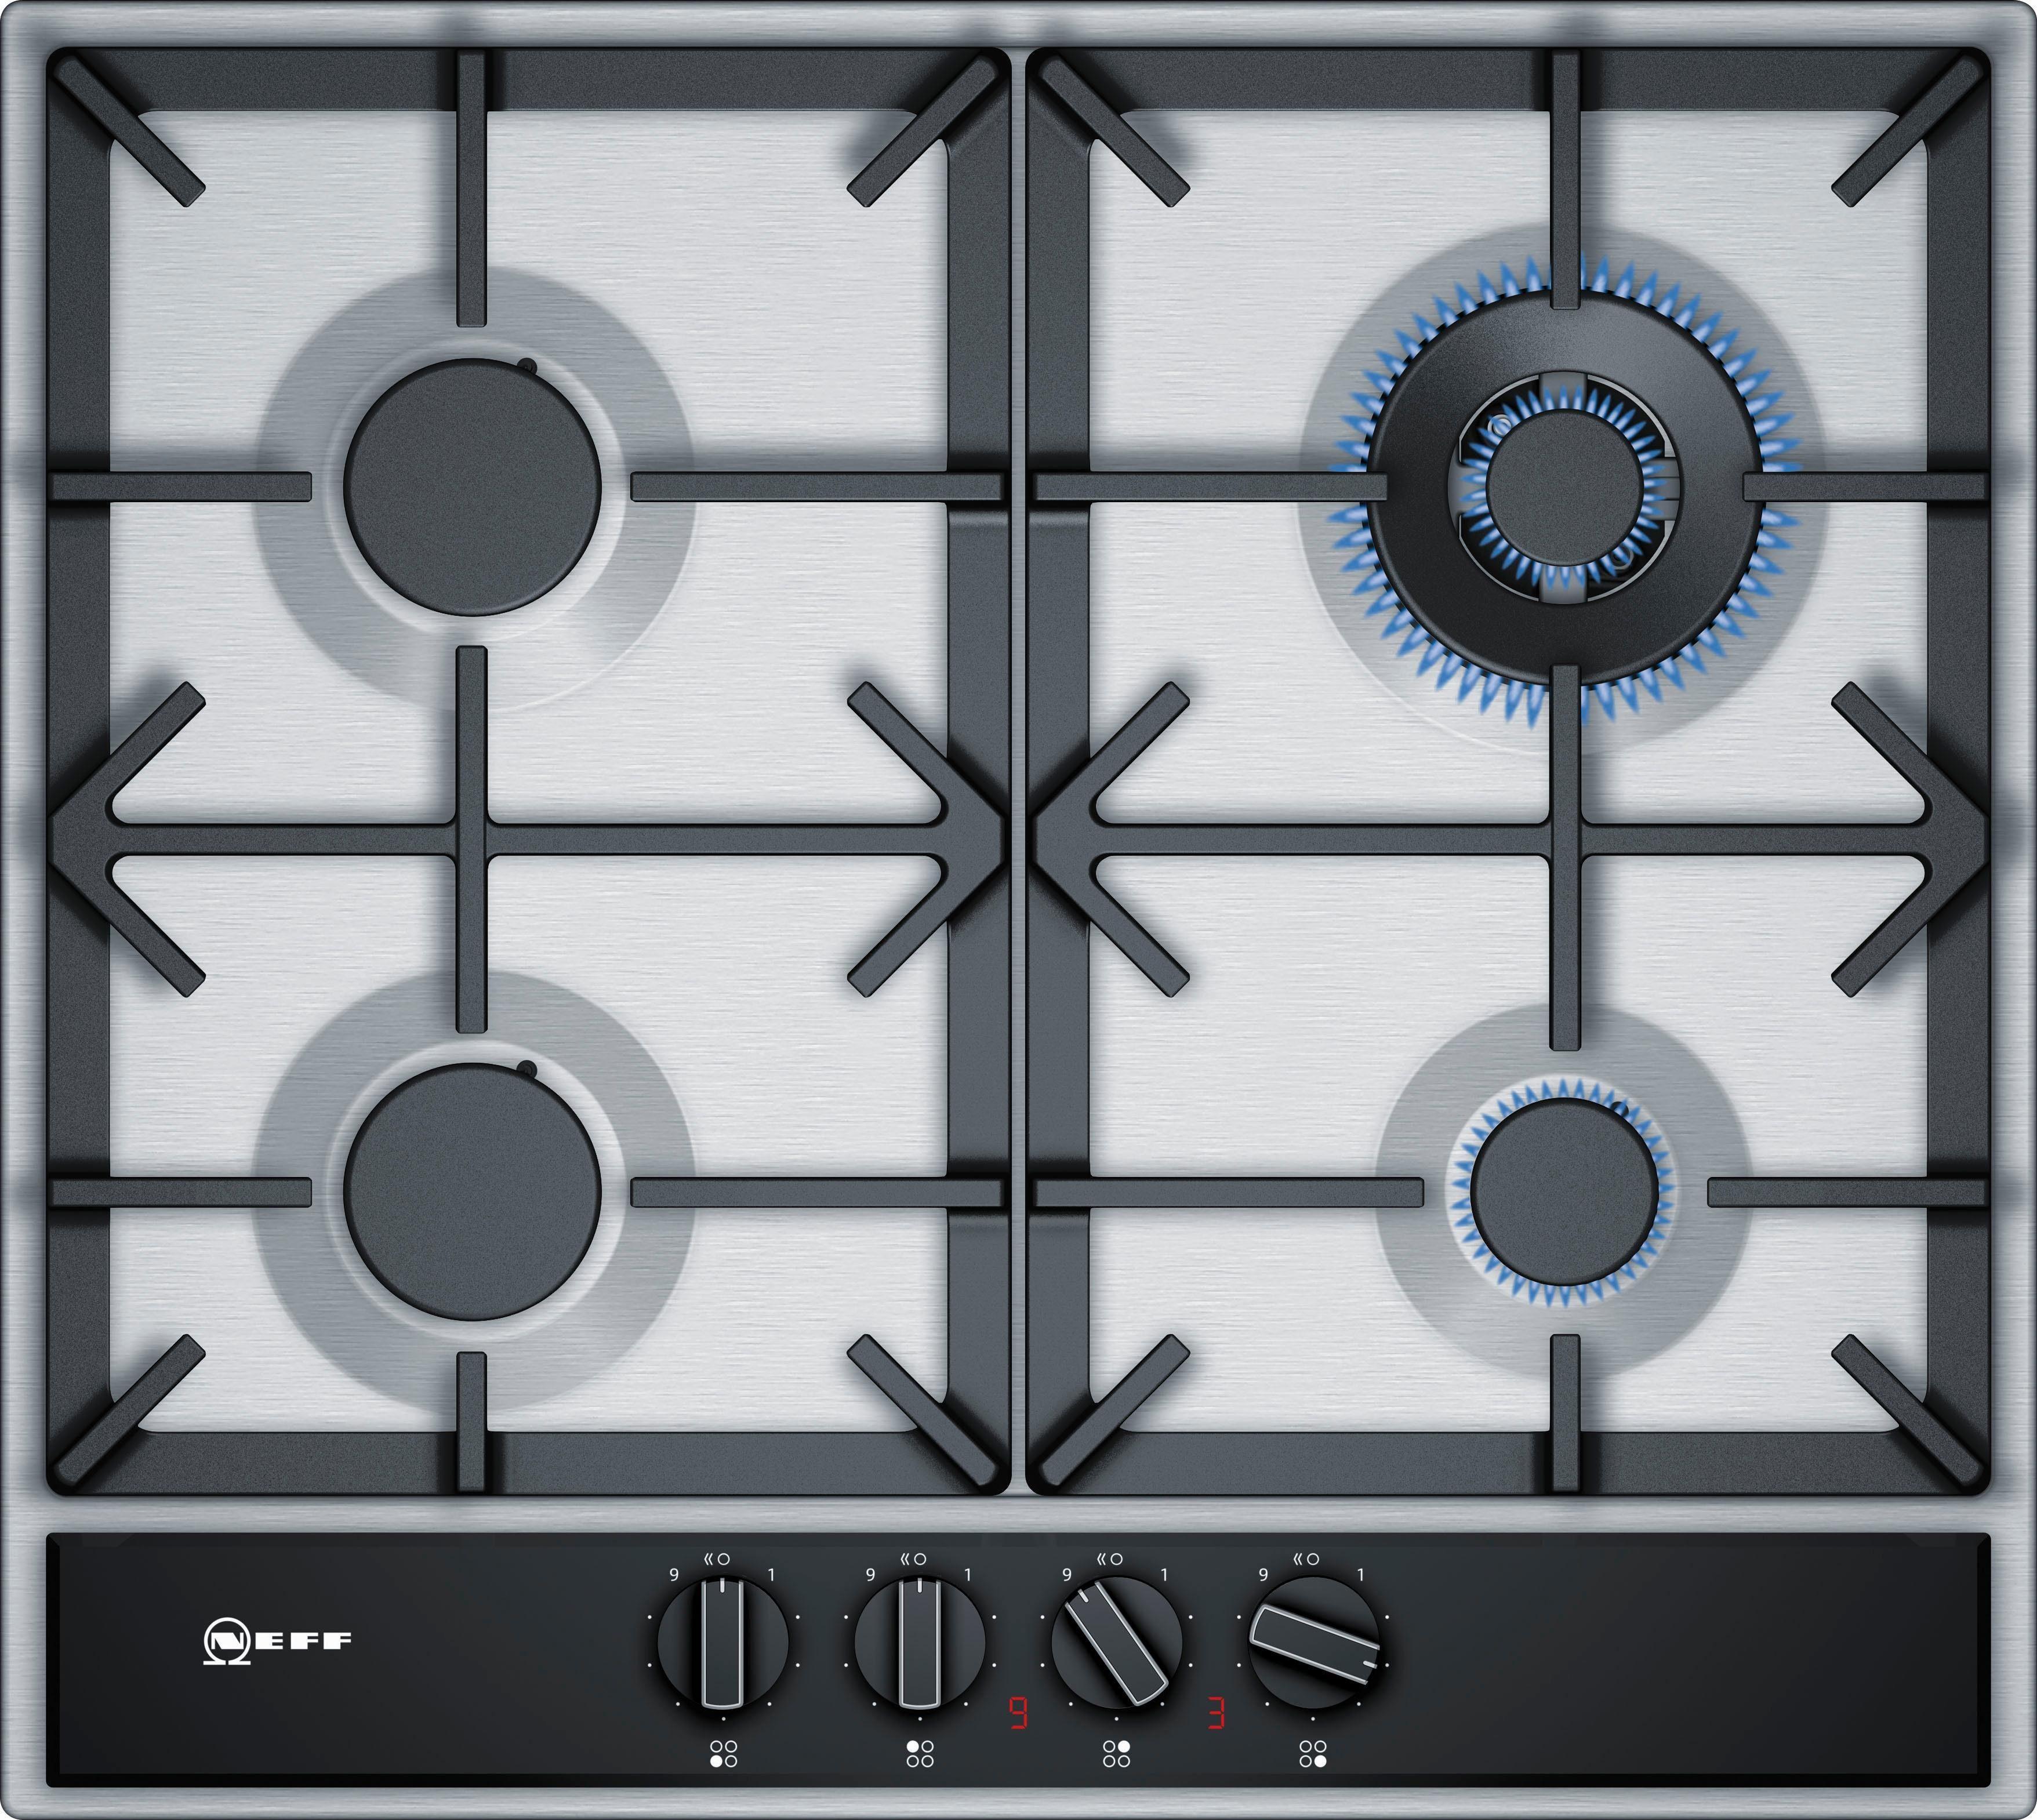 NEFF Gas-Kochfeld TDA2659N / T26DA59N0D, mit integrierten Kochstellenreglern